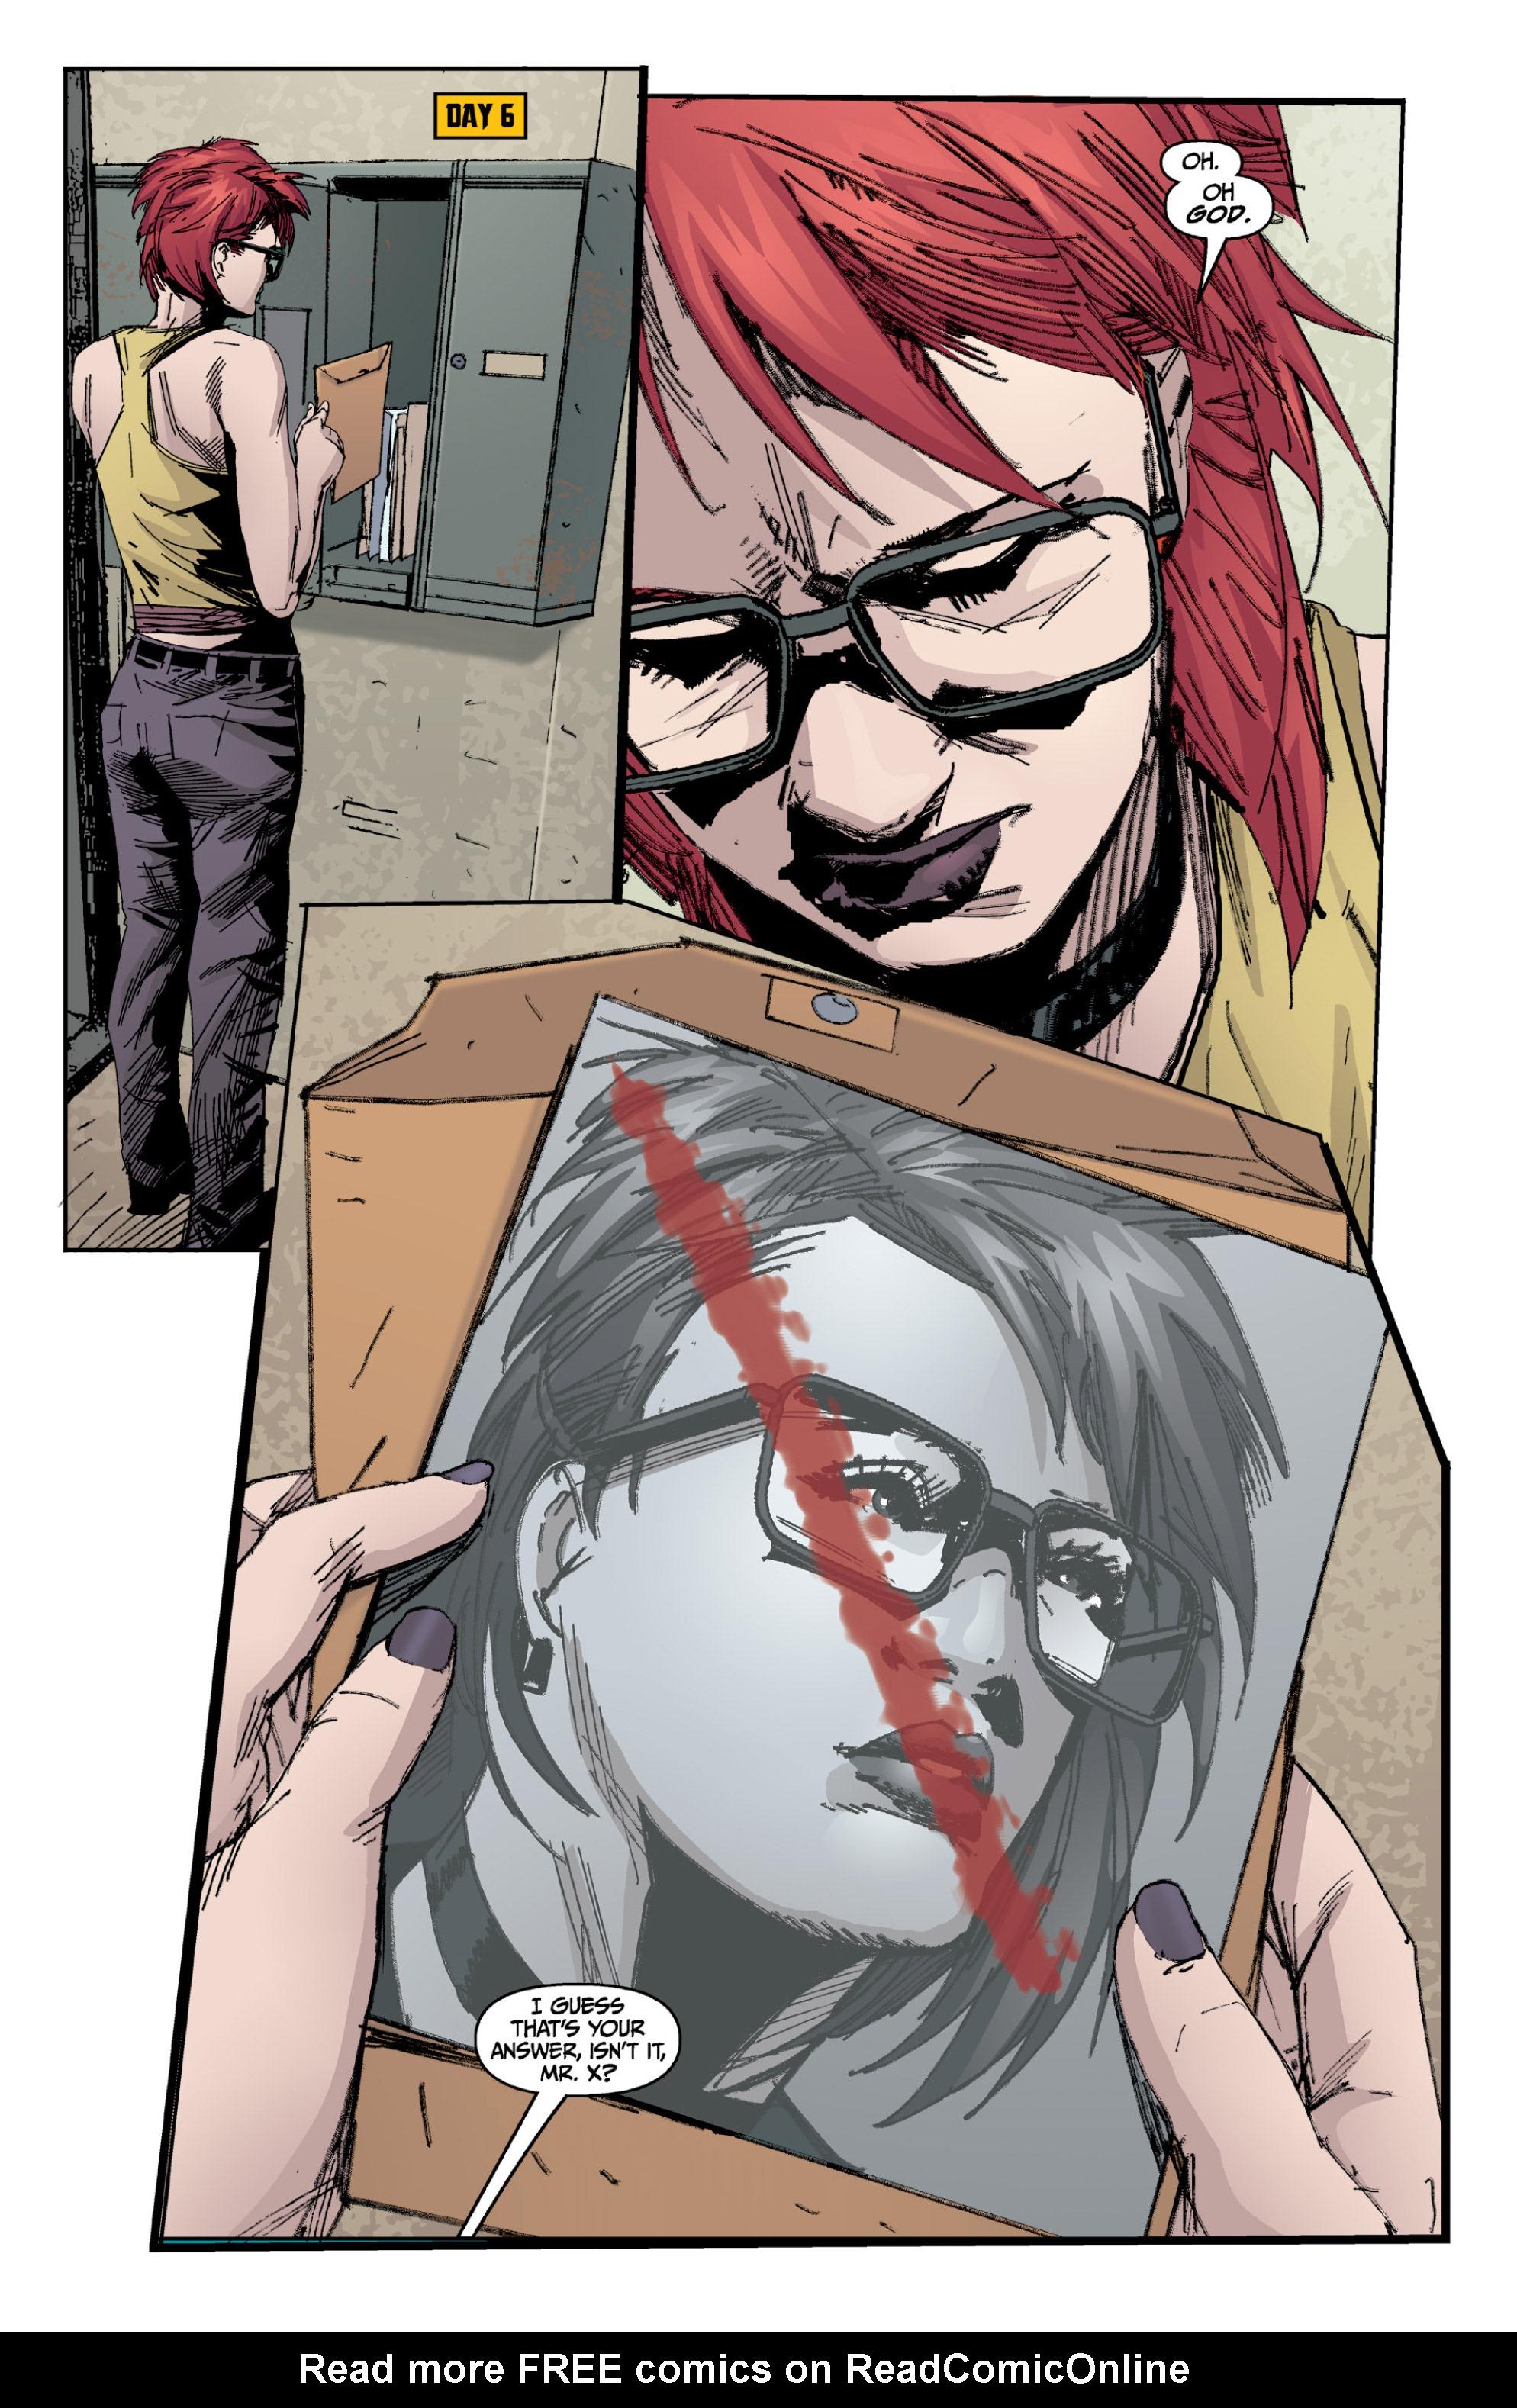 Read online X: Big Bad comic -  Issue # Full - 78